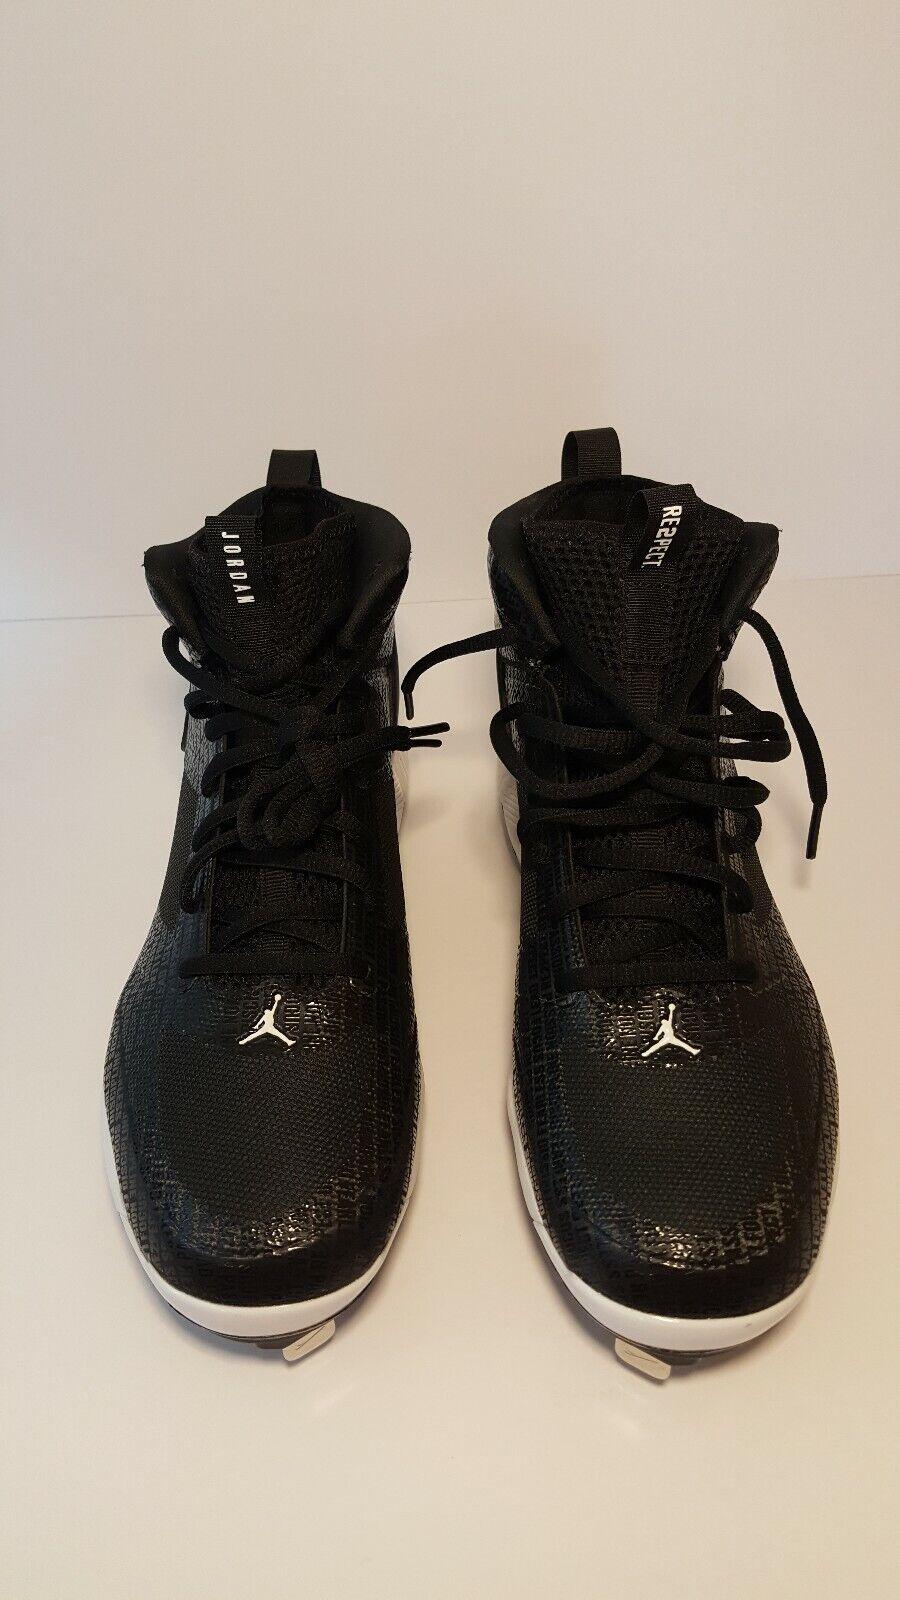 New Mens Nike Jordan Jeter Clutch Black Baseball Cleats AO2914 002 SZ 8